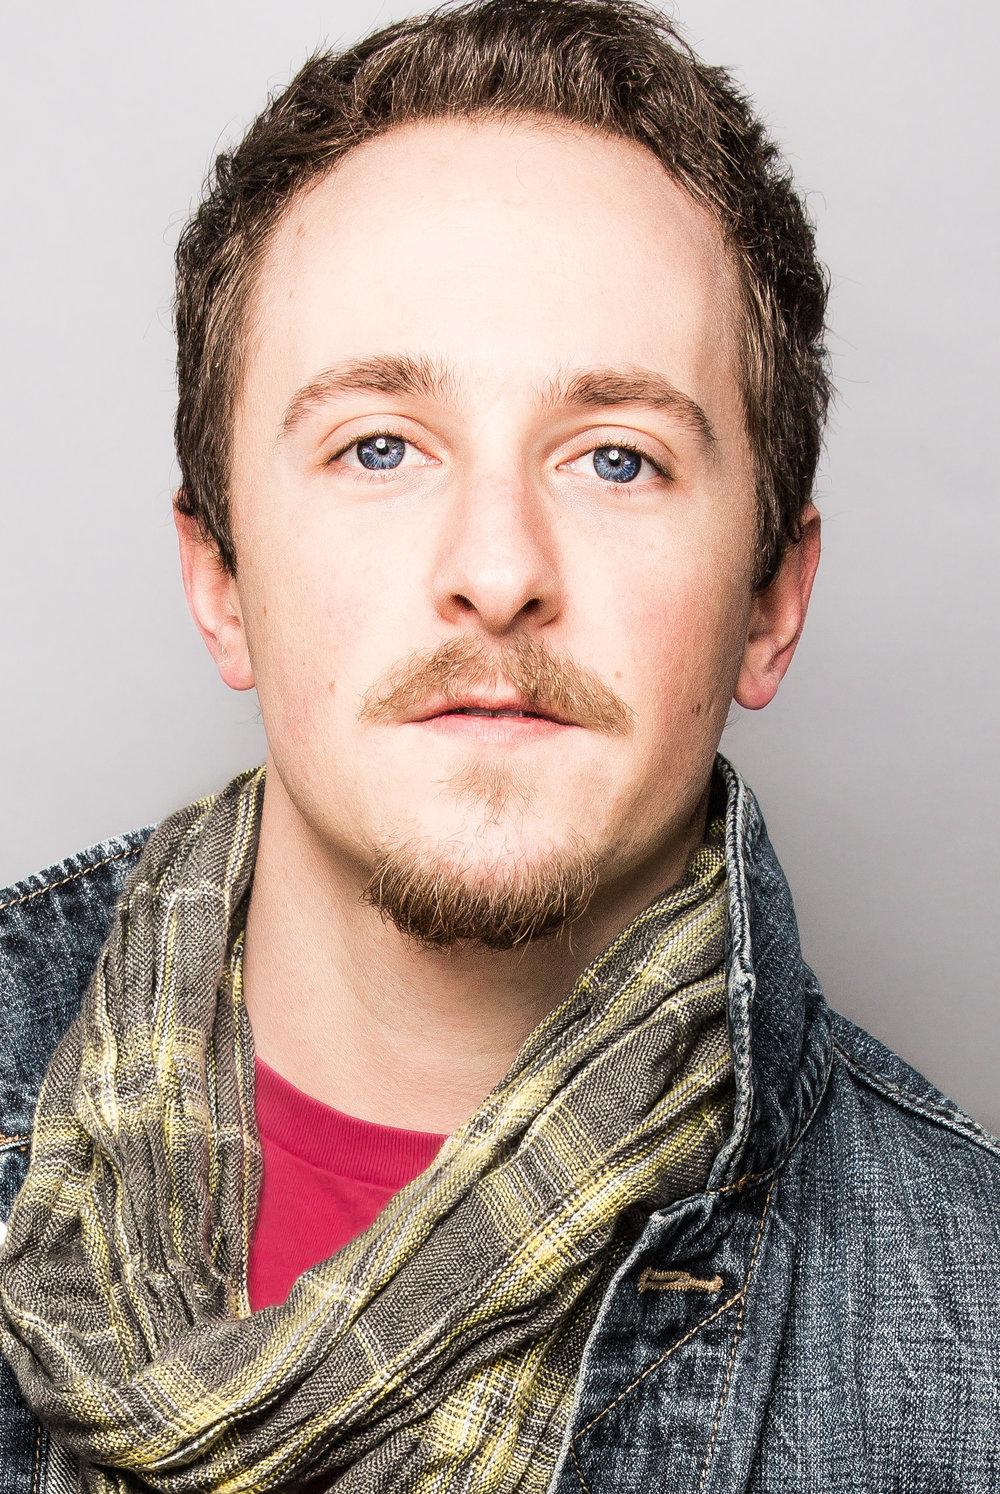 Parker Slaybaugh